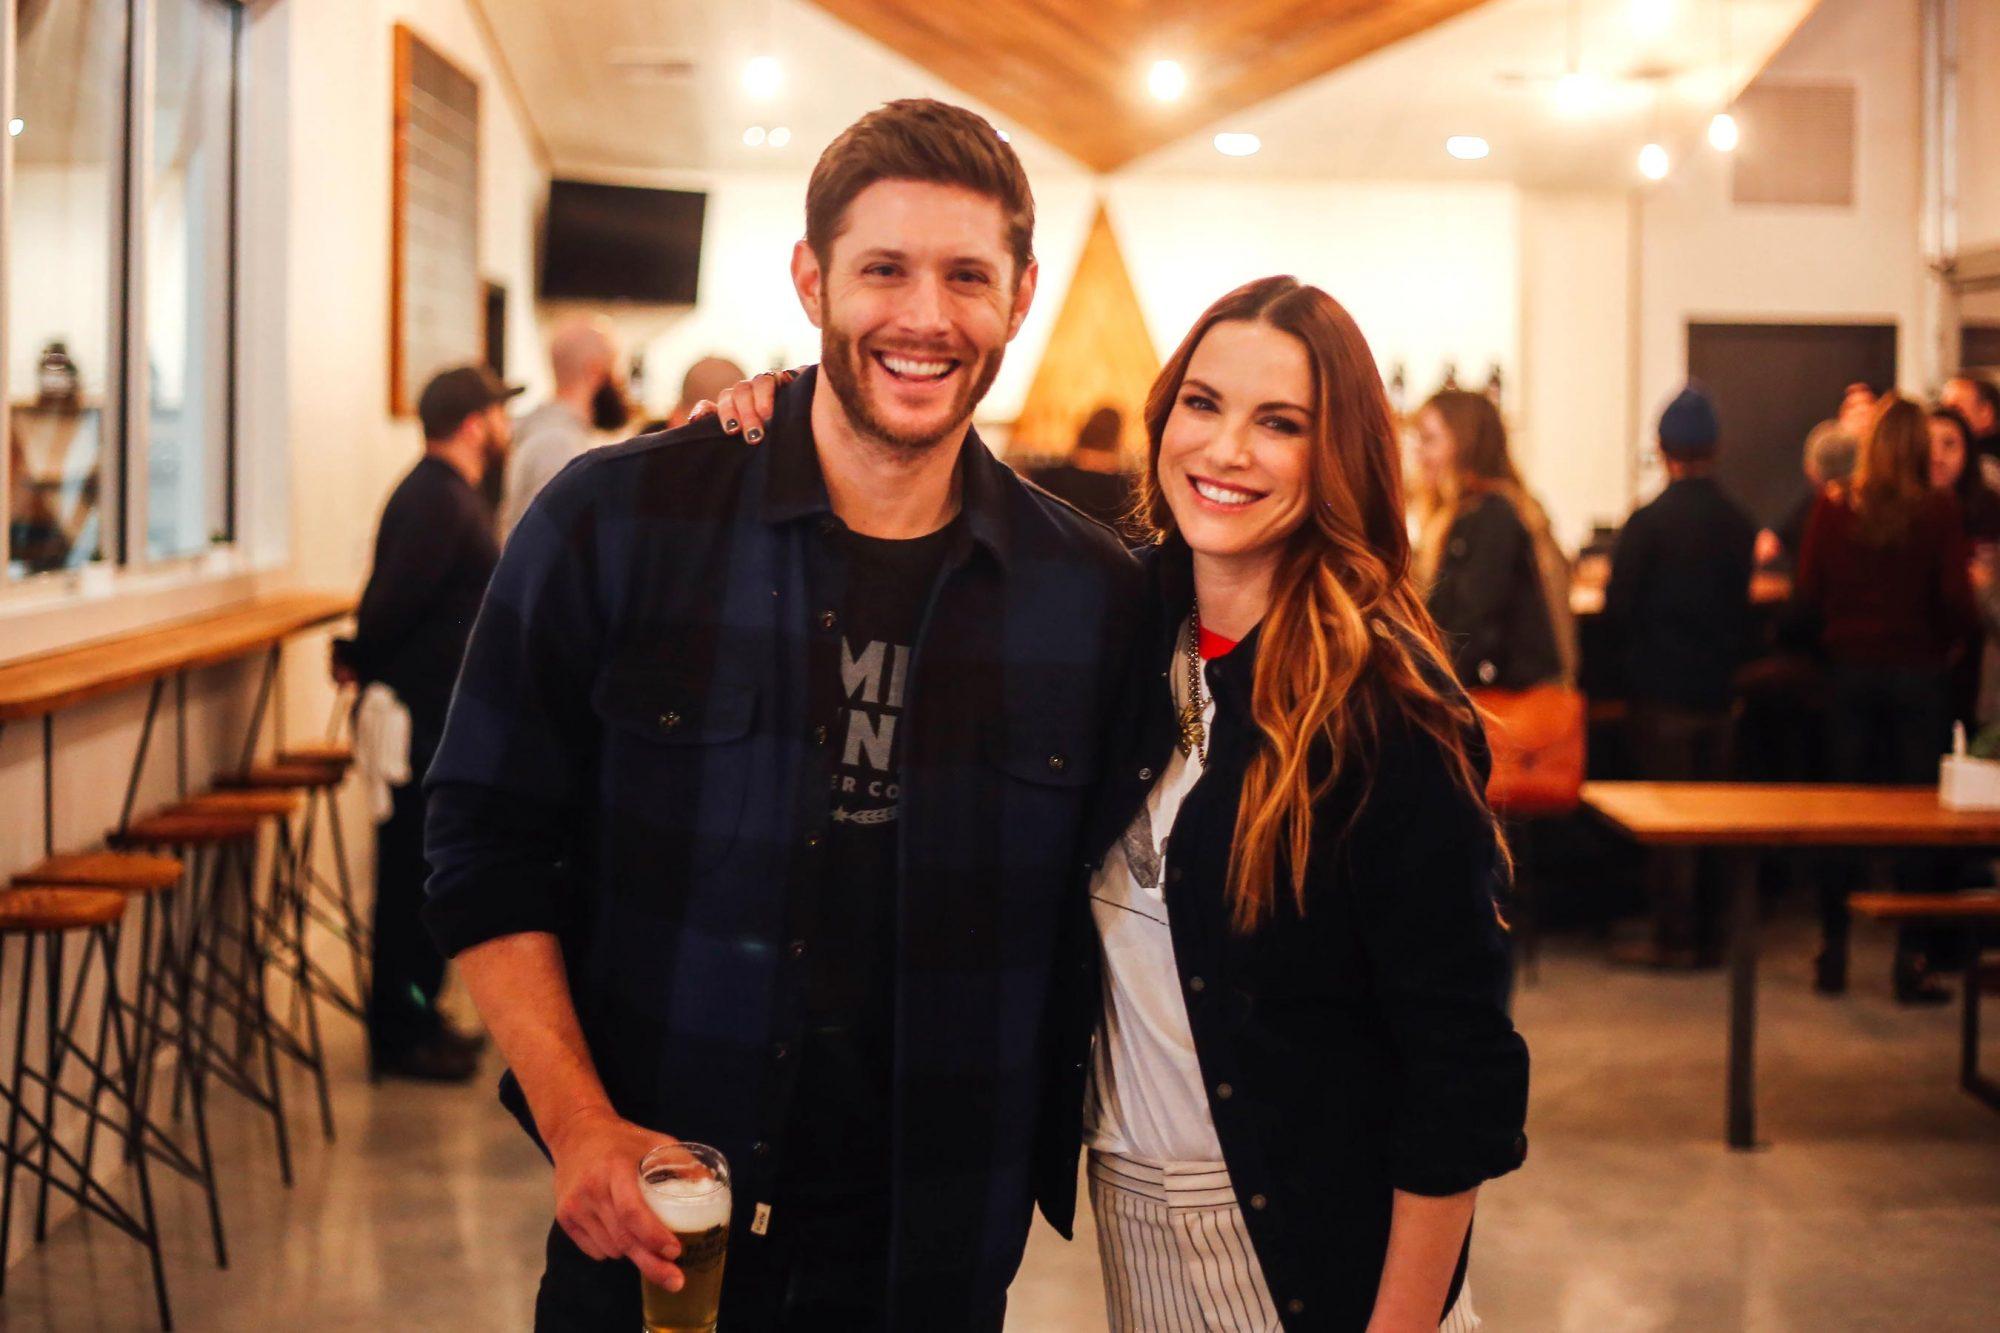 Jensen Ackles Family Business Beer Co CR: Julia Keim